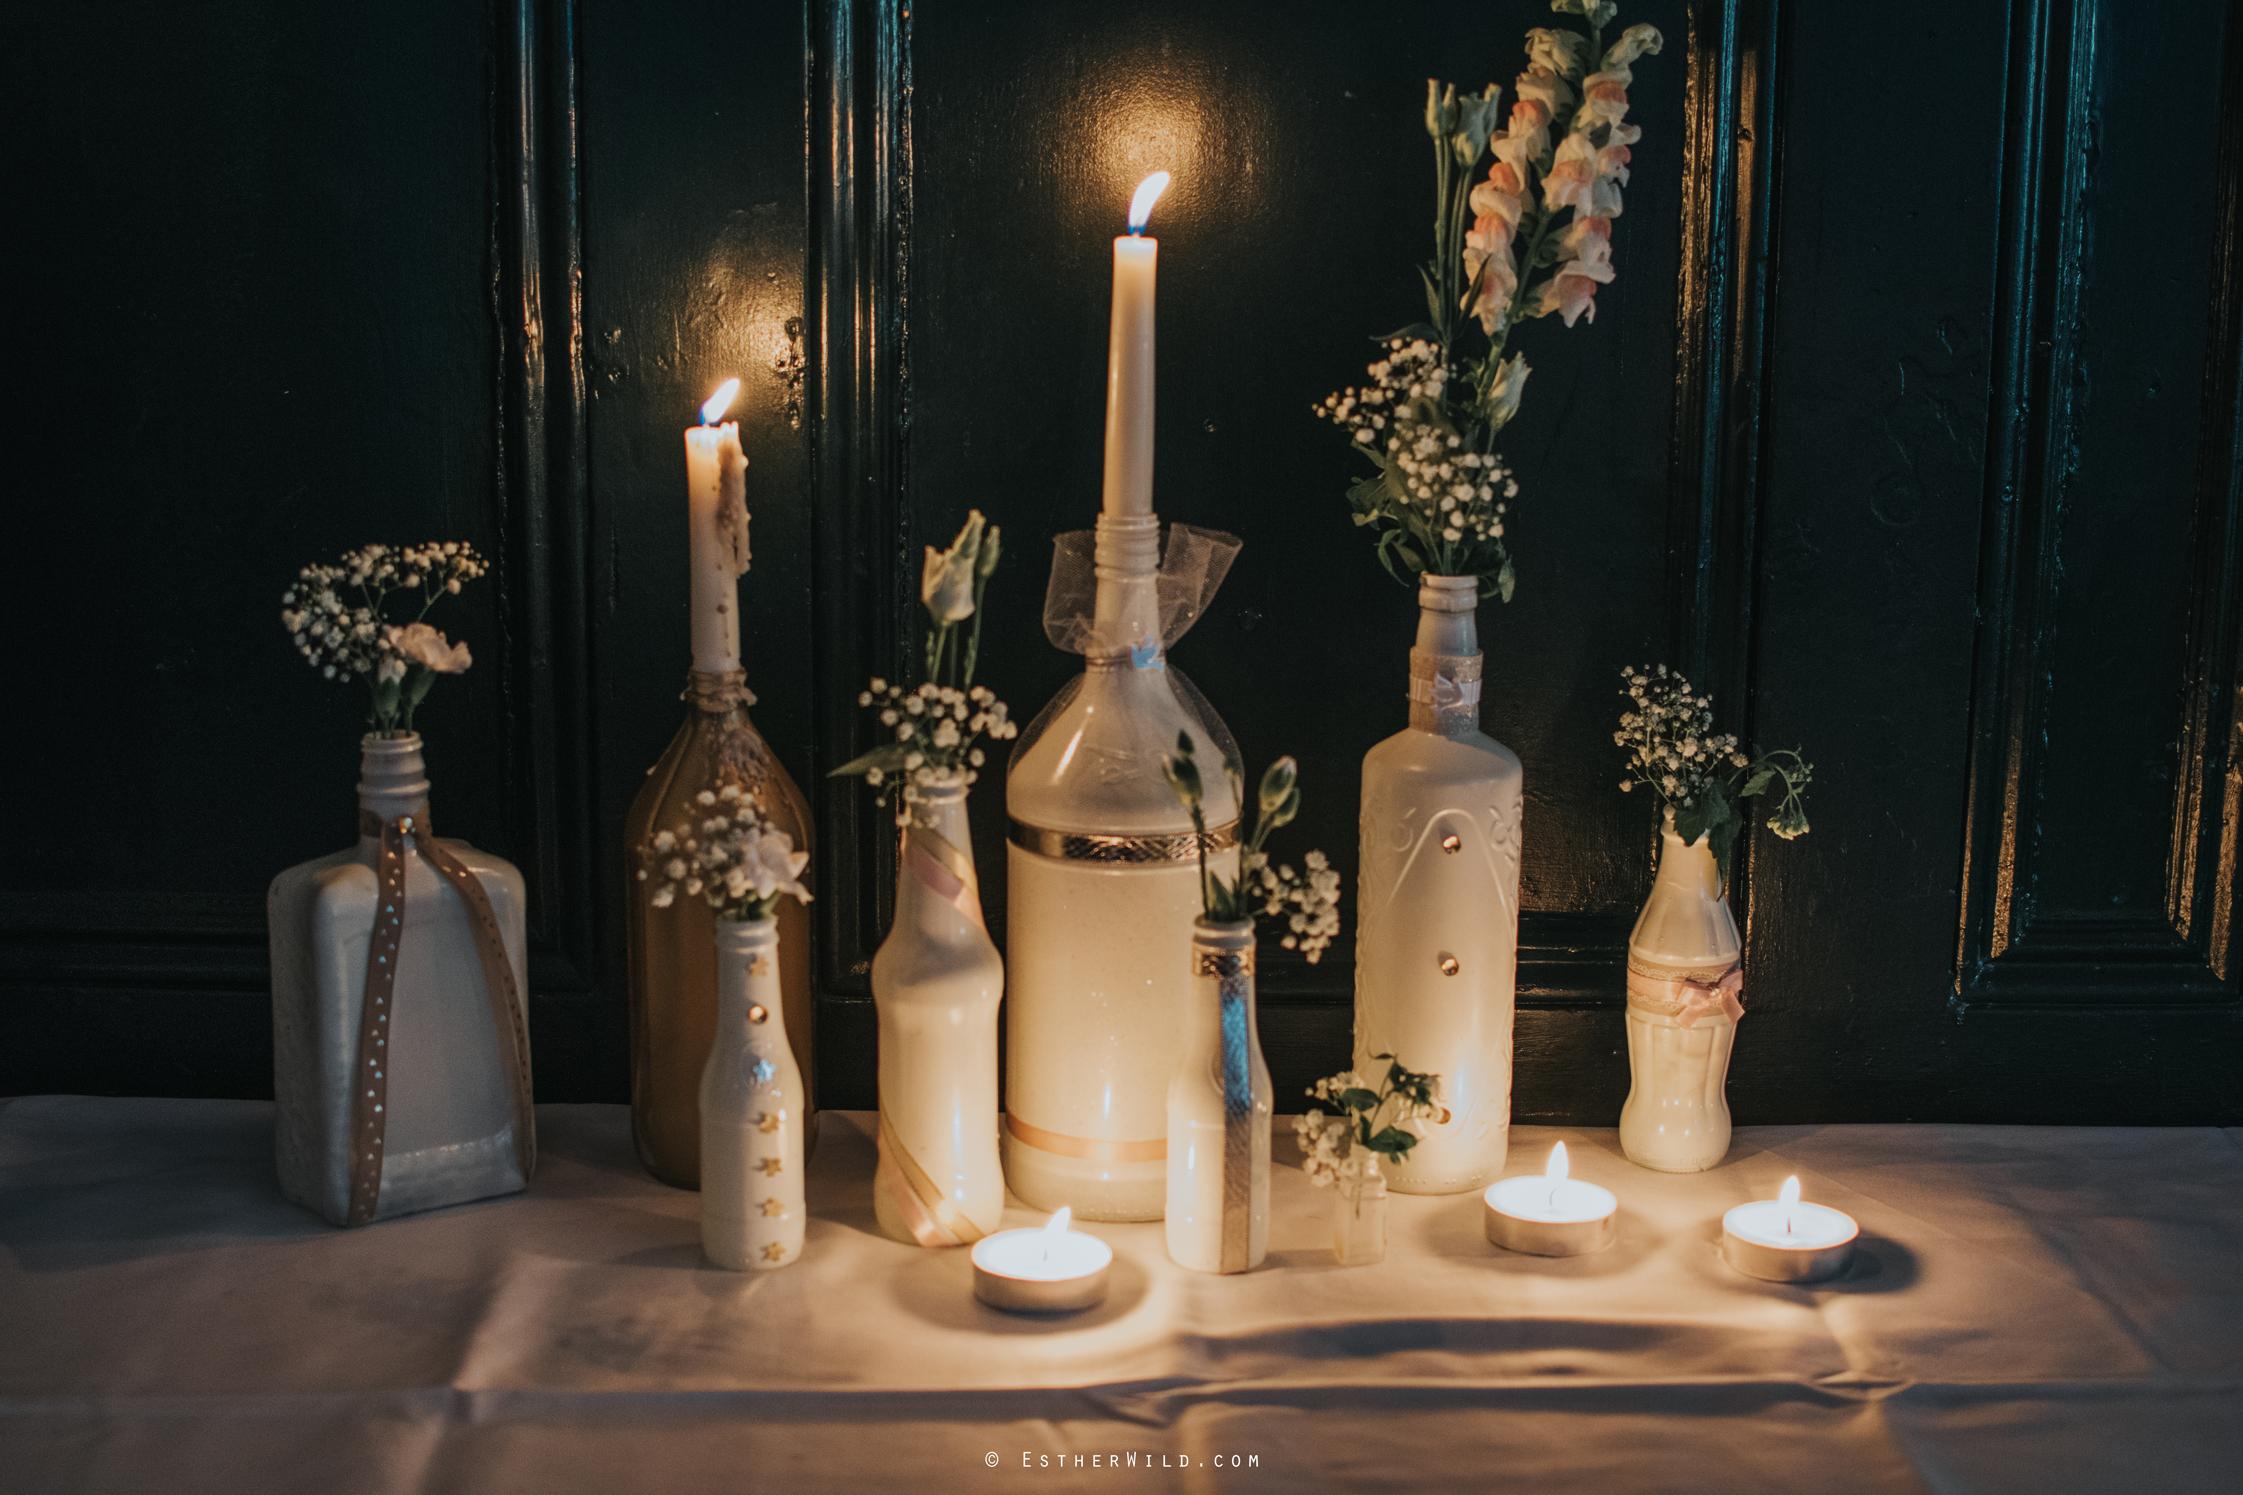 Islington_Town_Hall_Wedding_London_Photographer_Esther_Wild_IMG_7331_DSC_0515.jpg